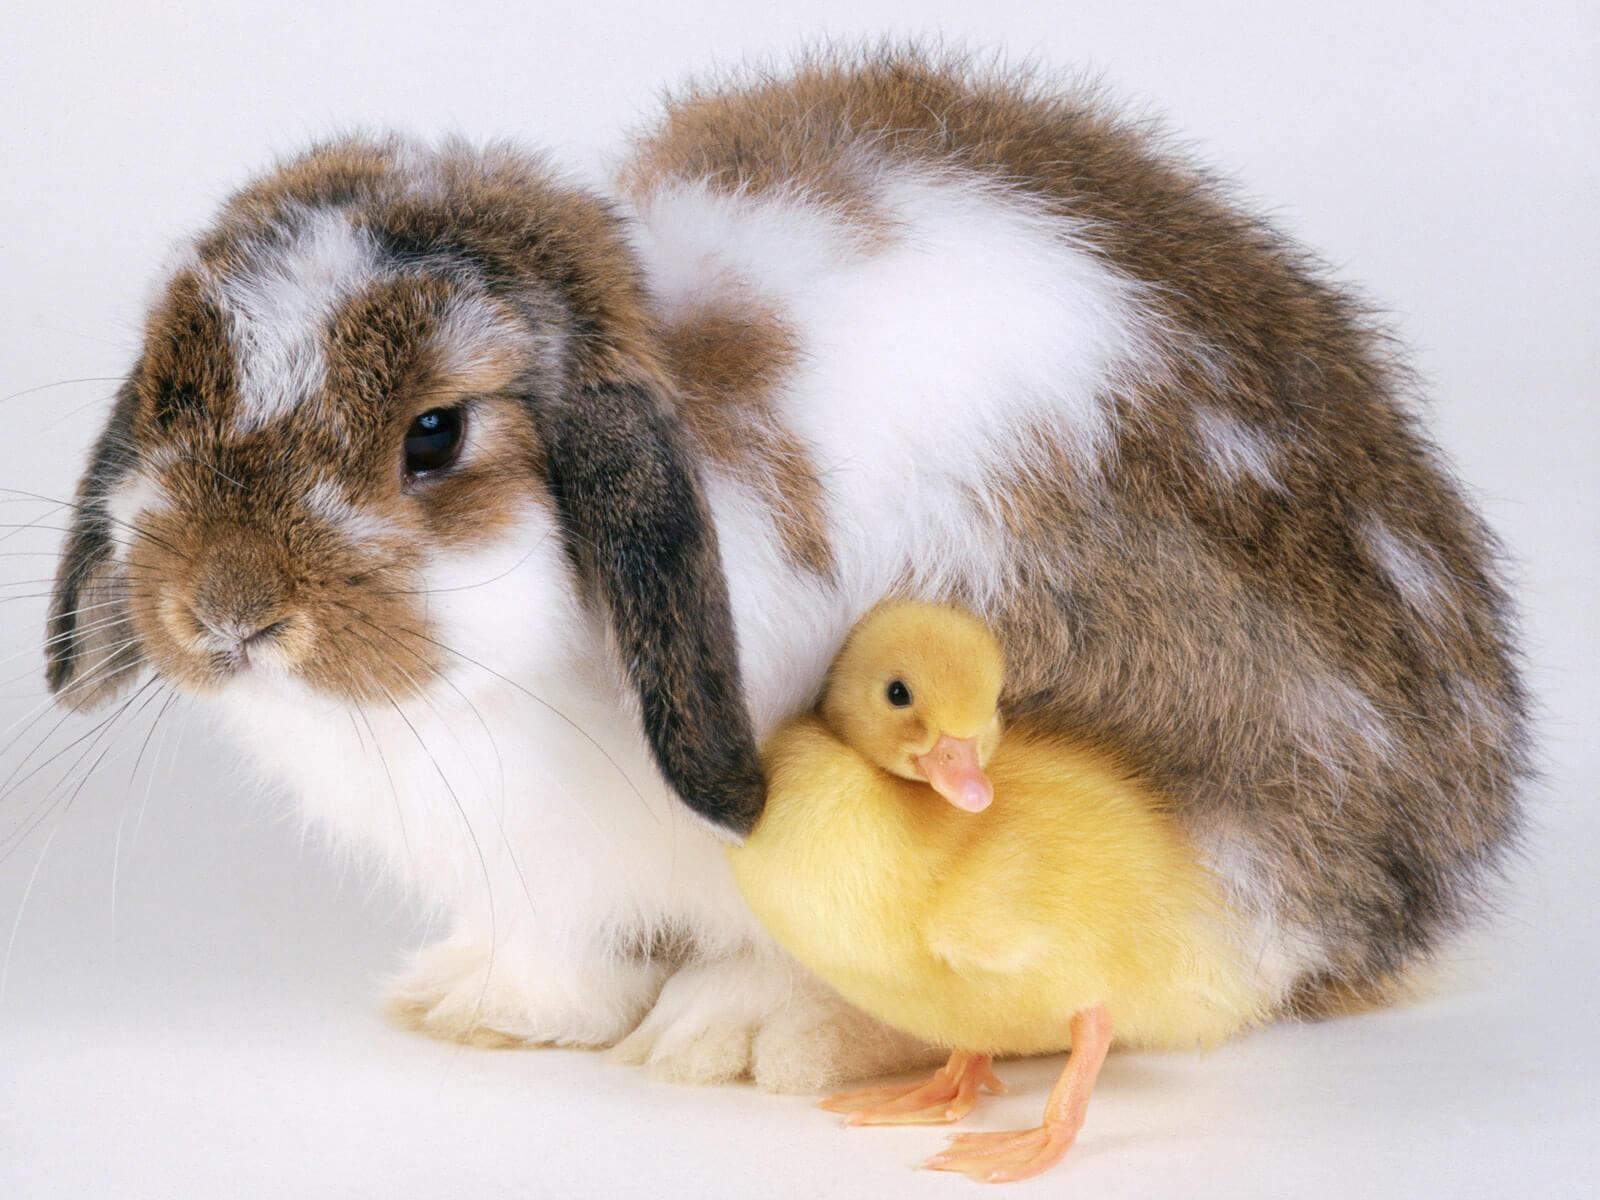 PDSA charity rabbit and duck